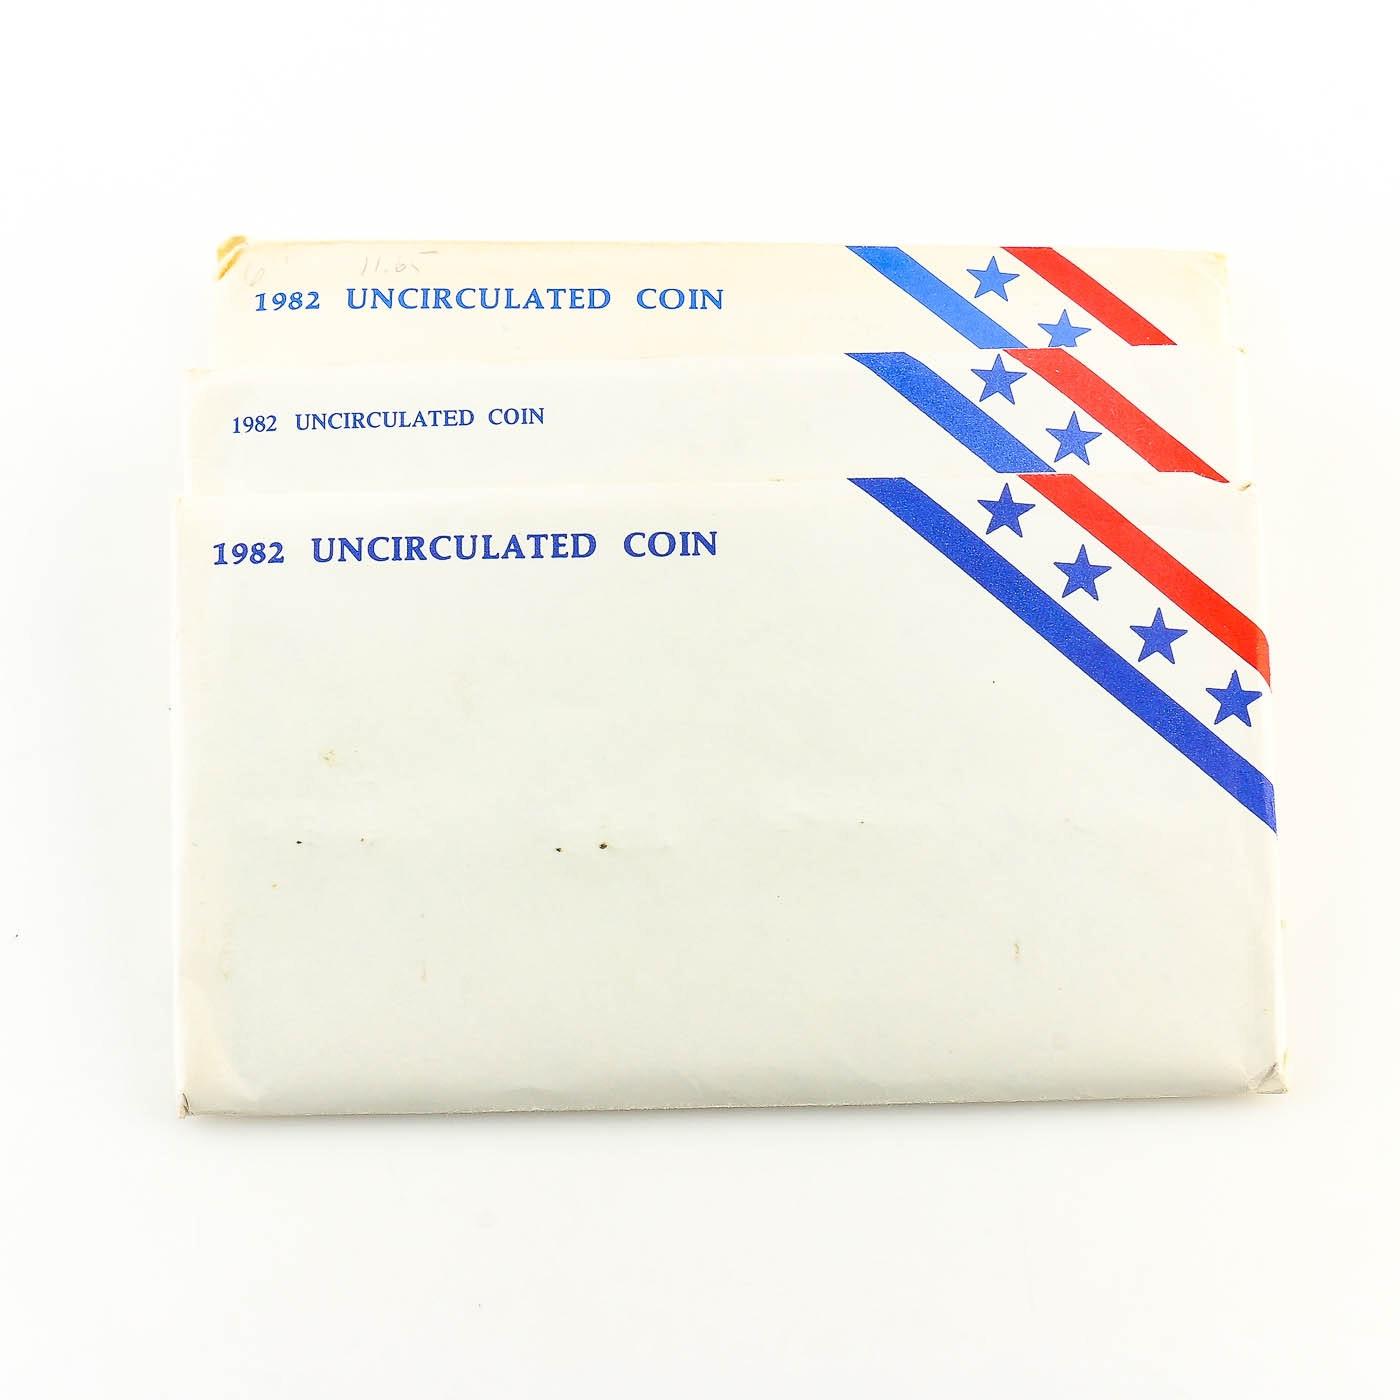 Three 1982 U.S. Uncirculated Coin Sets